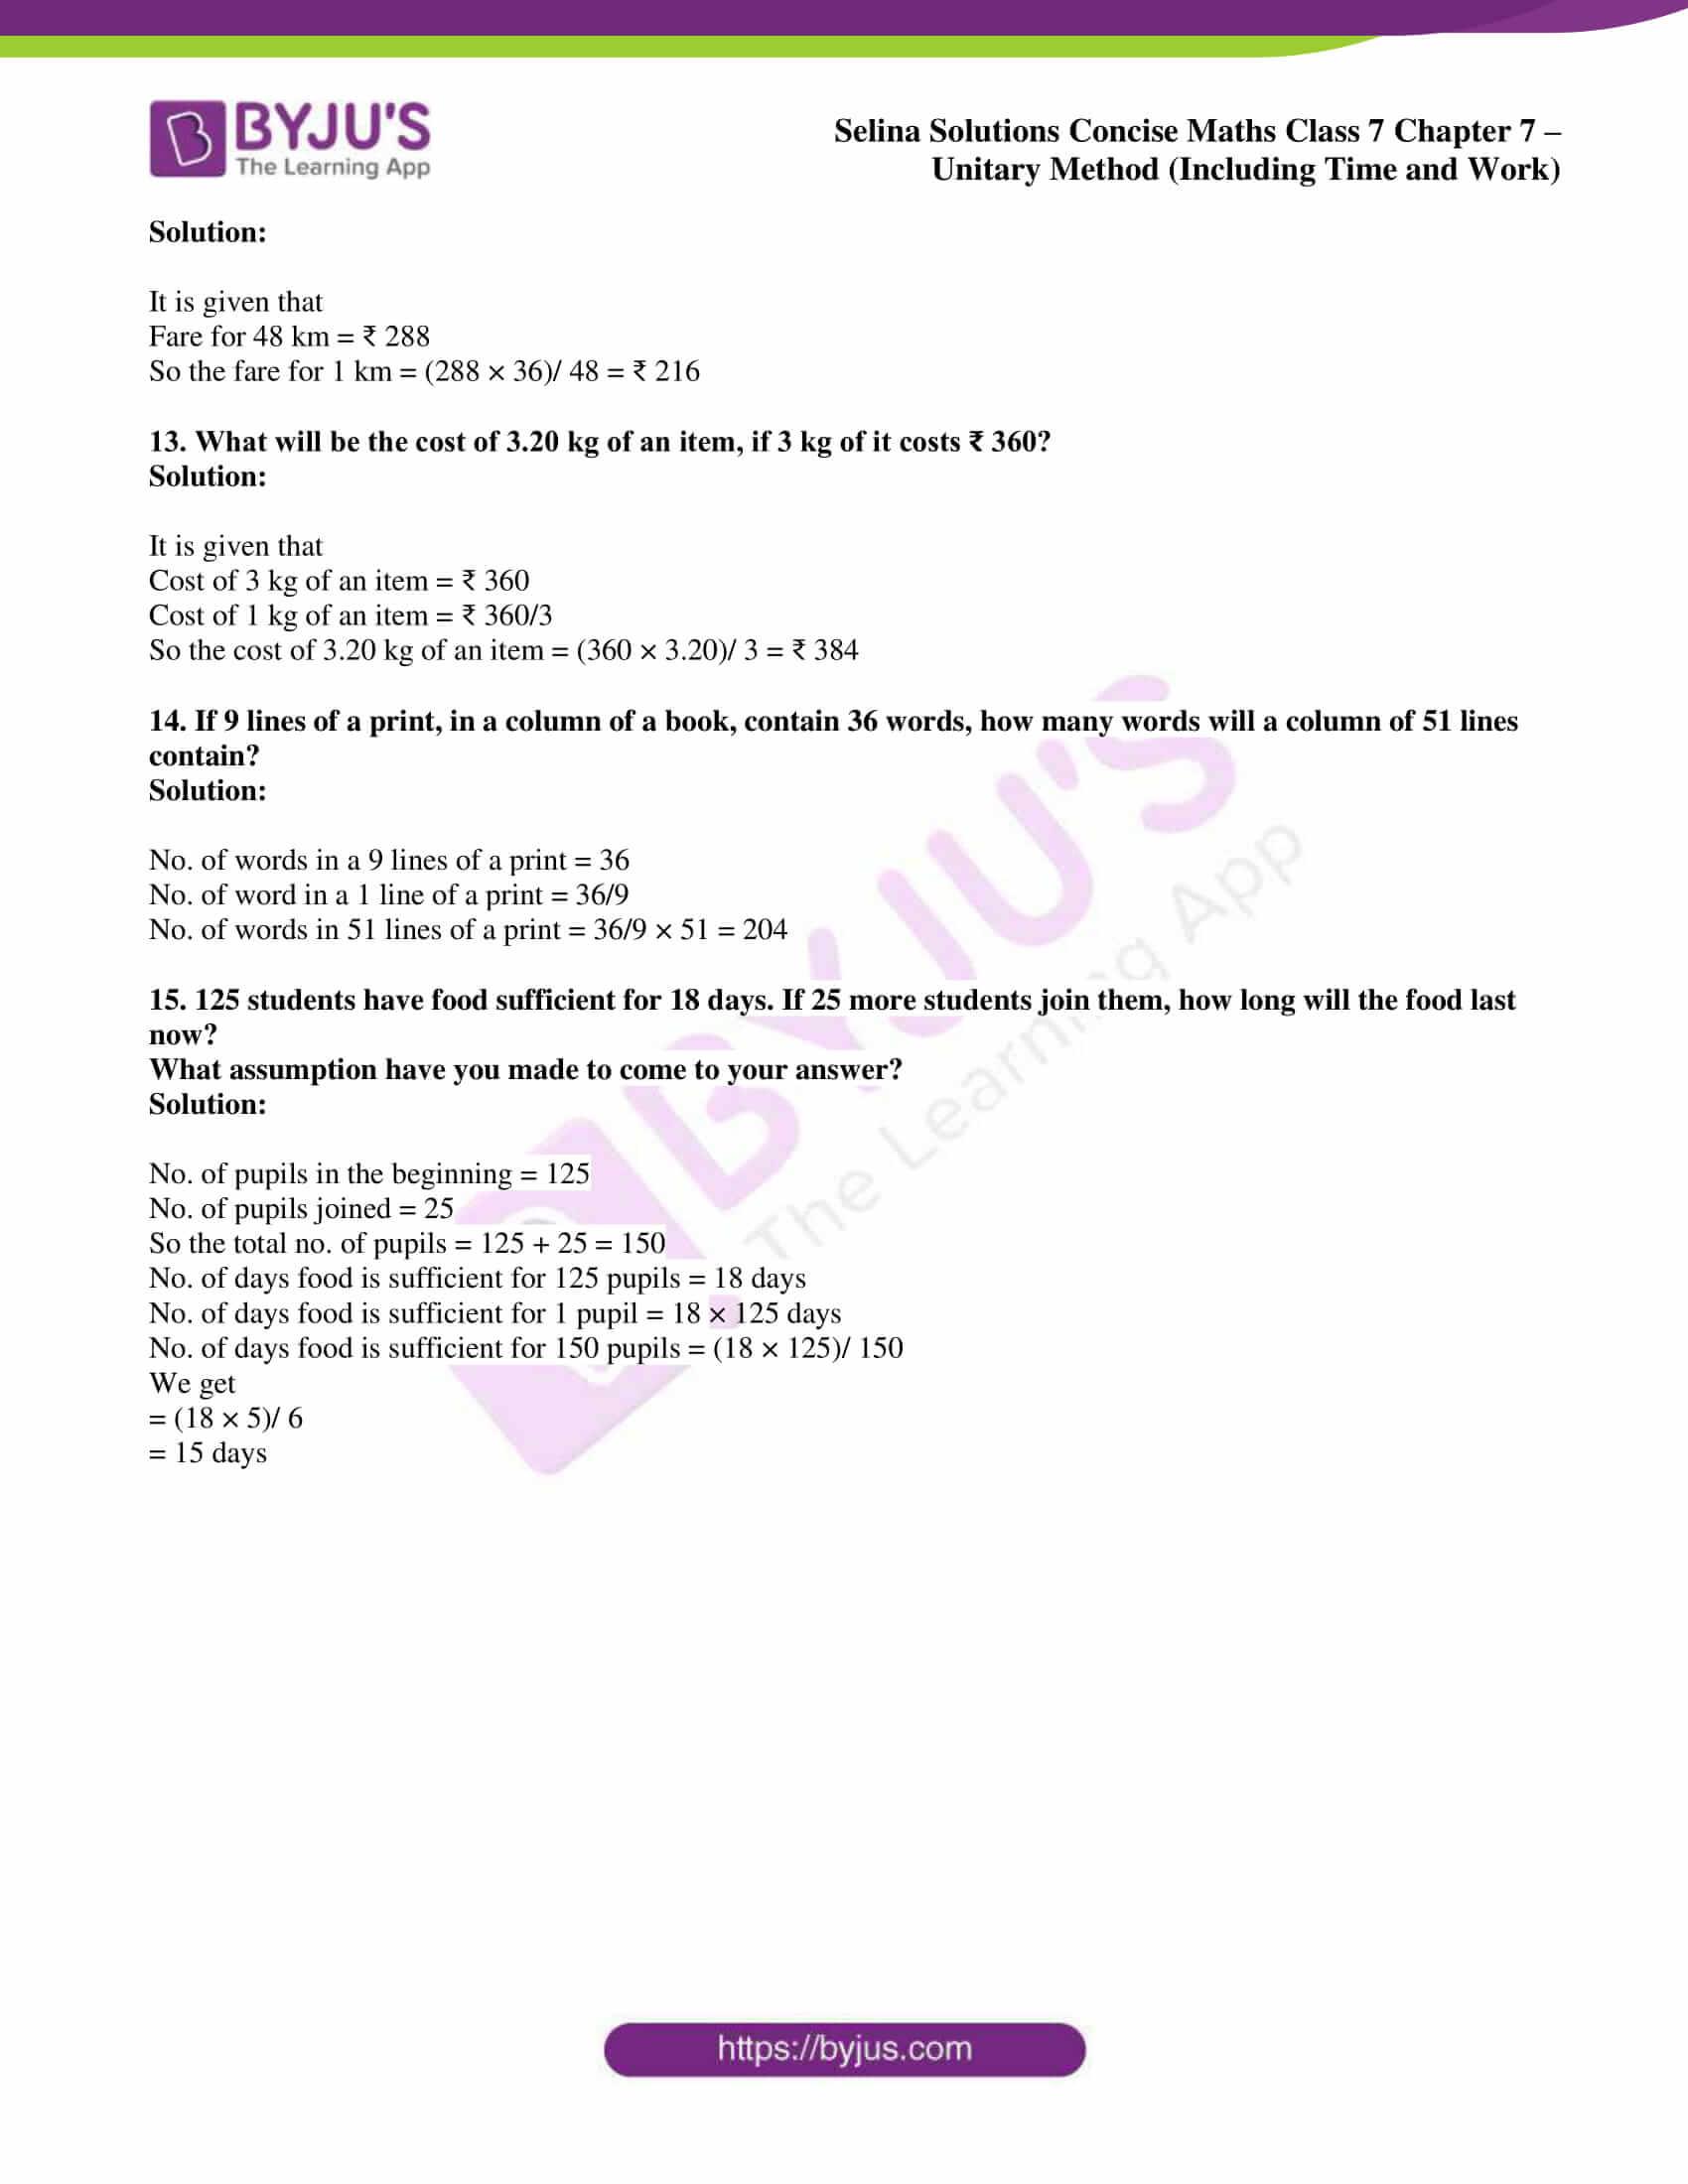 selina sol concise maths class 7 ch7 ex 7a 3